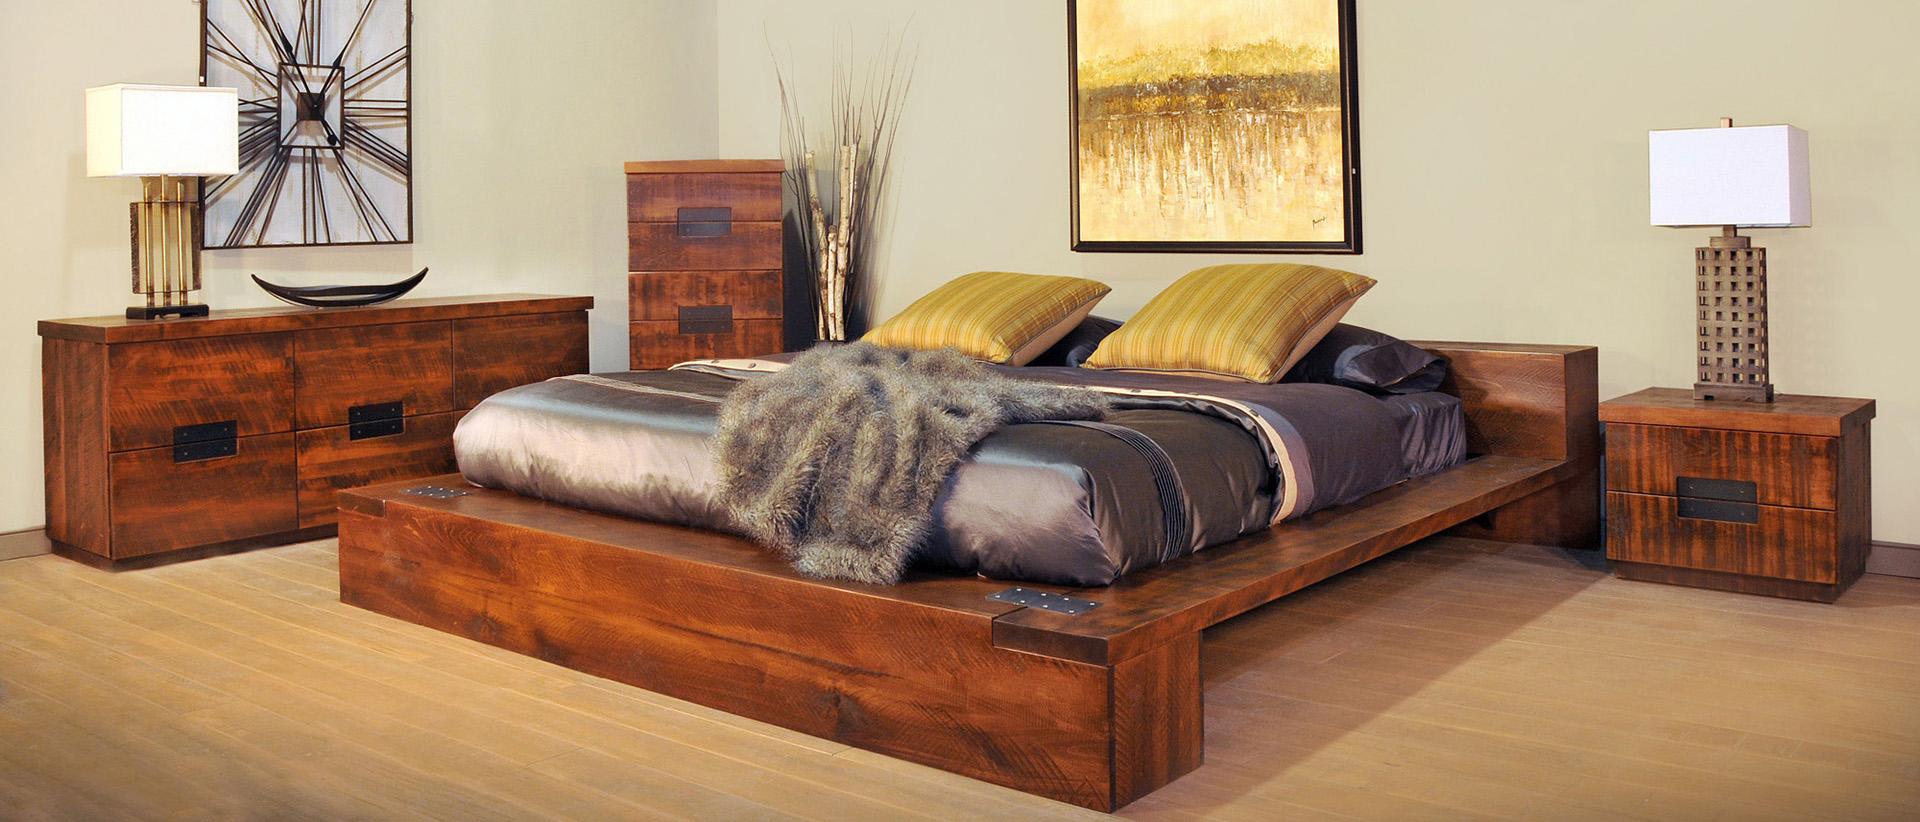 Amish Furniture, Custom Amish Furniture, Amish Furniture Store ...